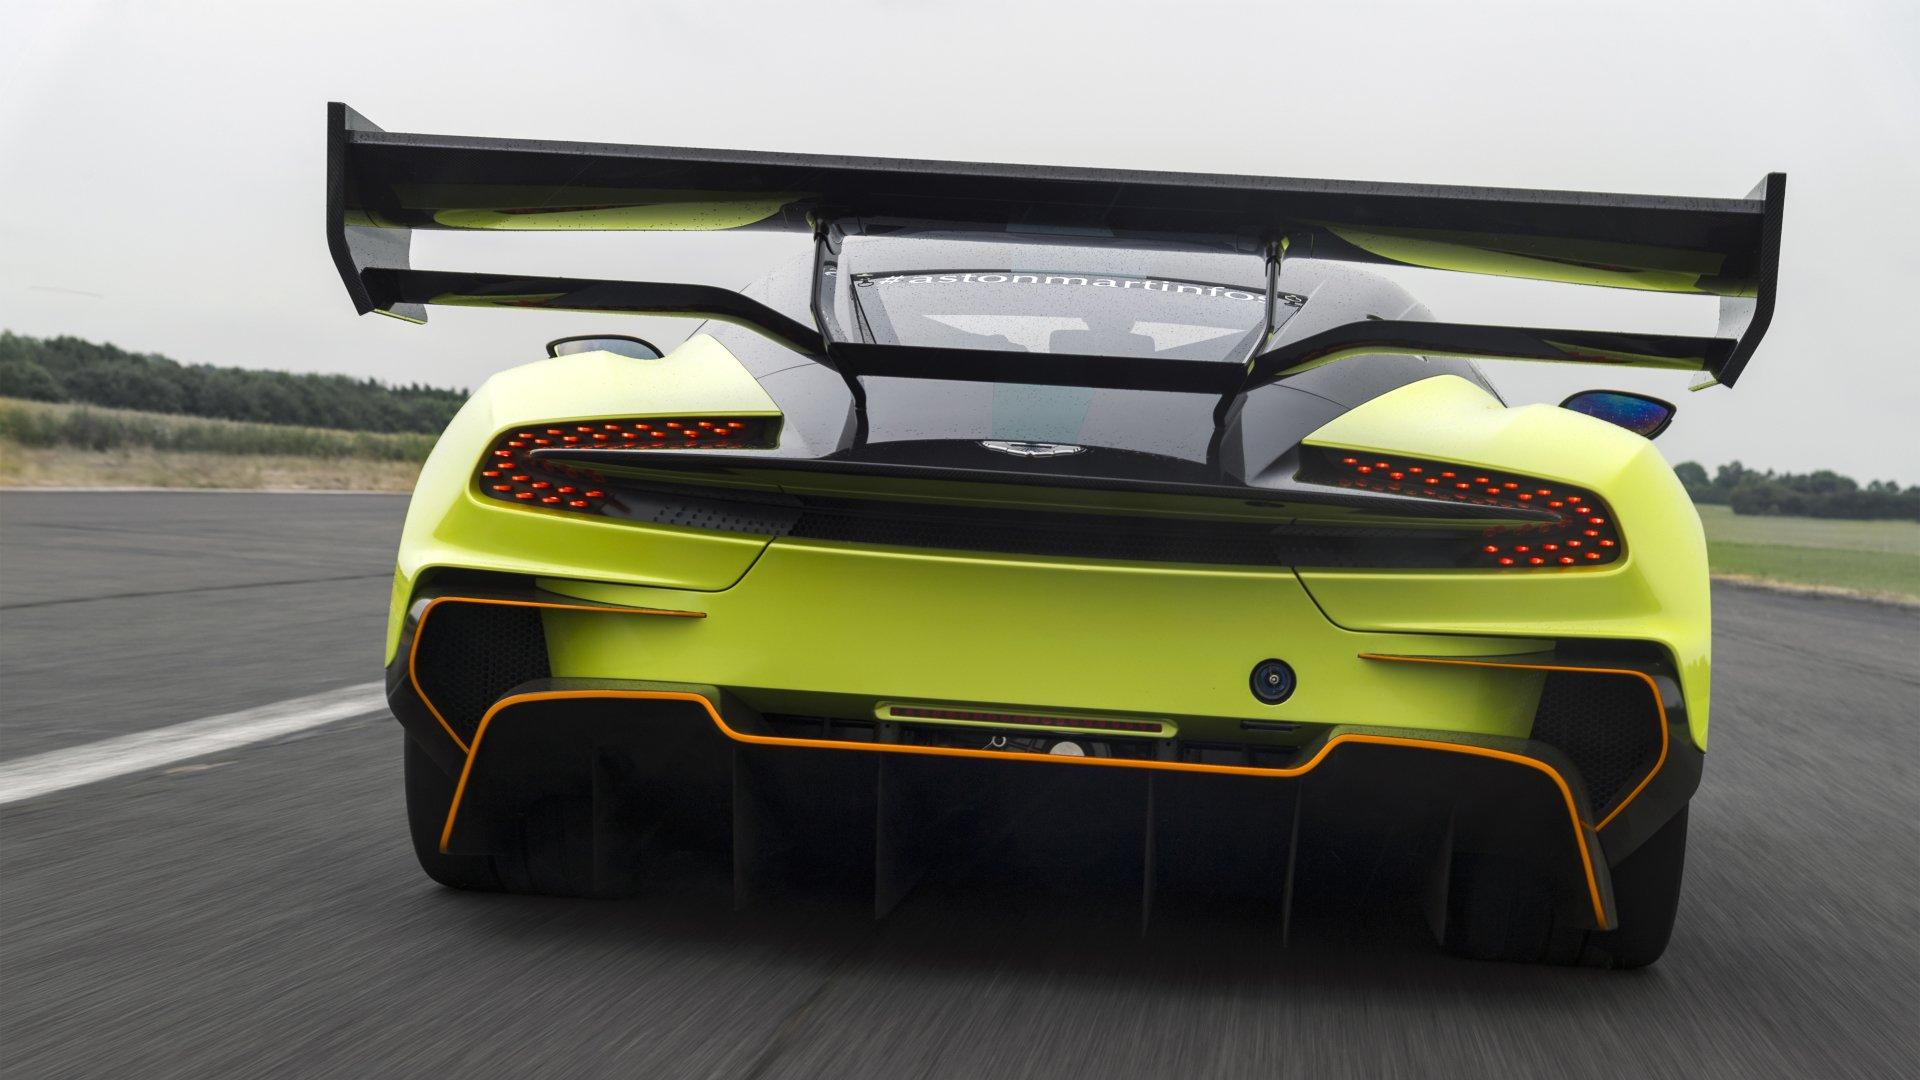 Vehicles - Aston Martin Vulcan  Aston Martin Vulcan AMR Pro Aston Martin Supercar Wallpaper